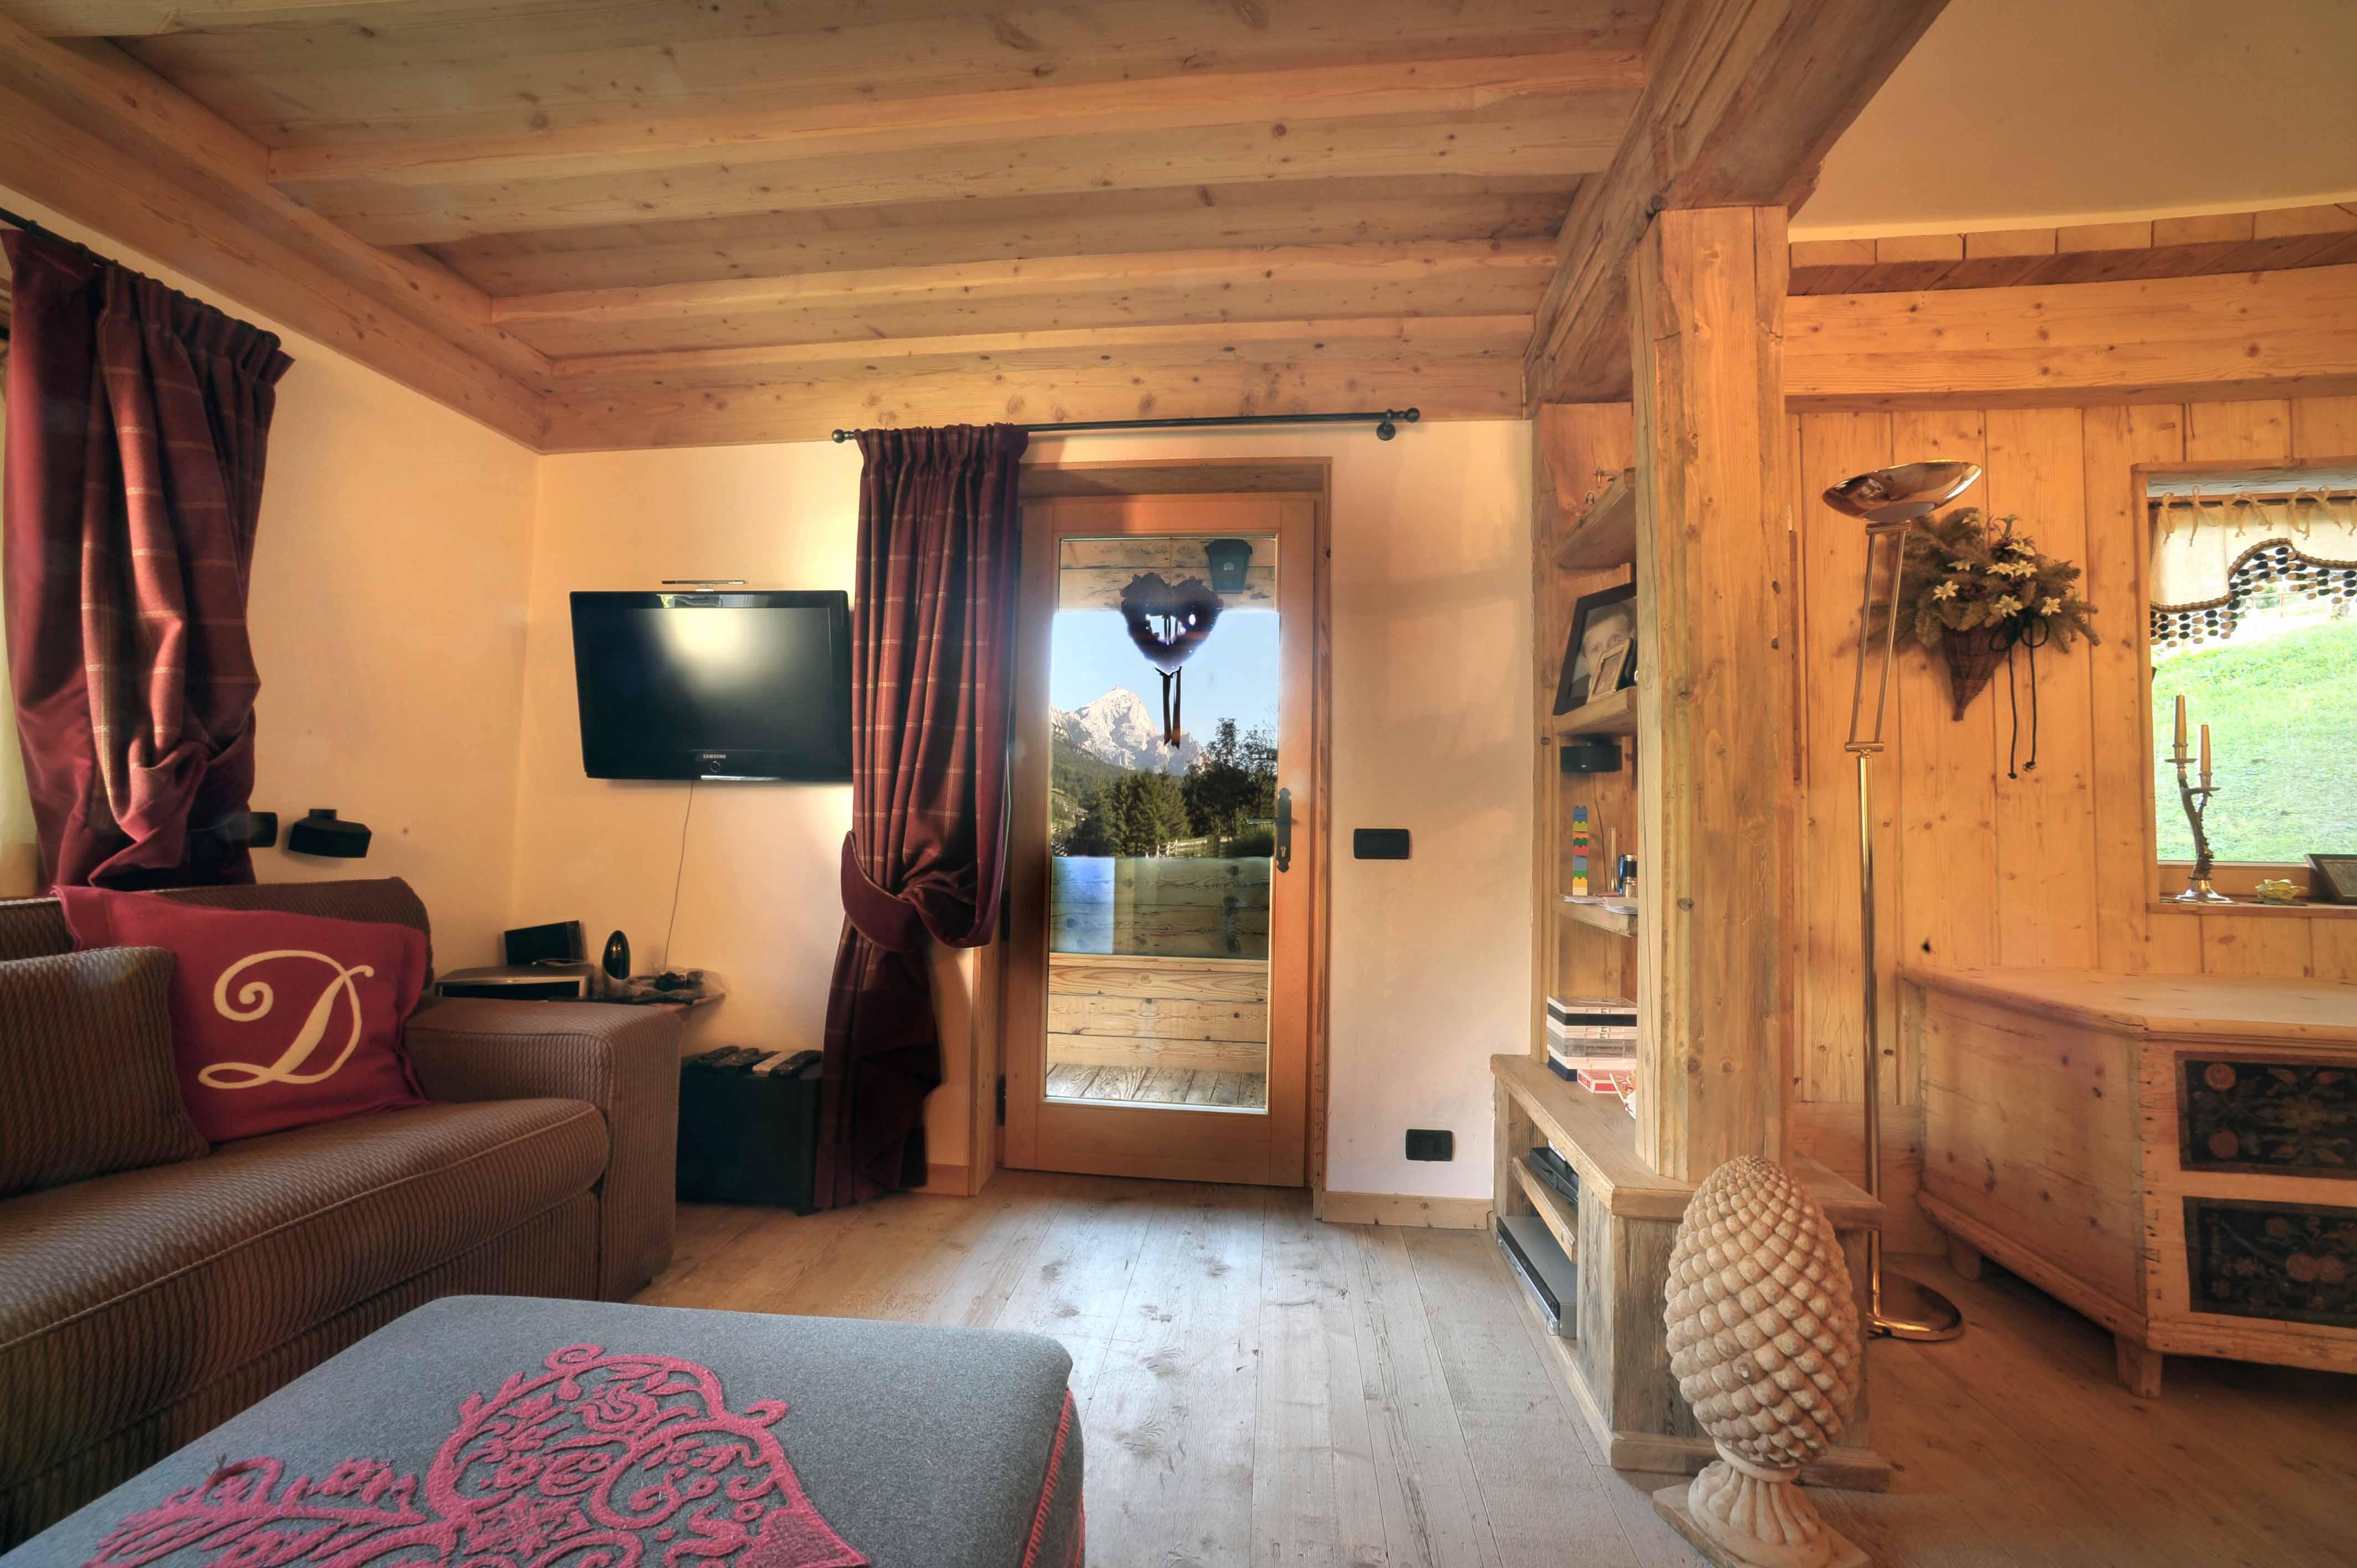 Appartamento cortina dampezzo u2013 gianese agency